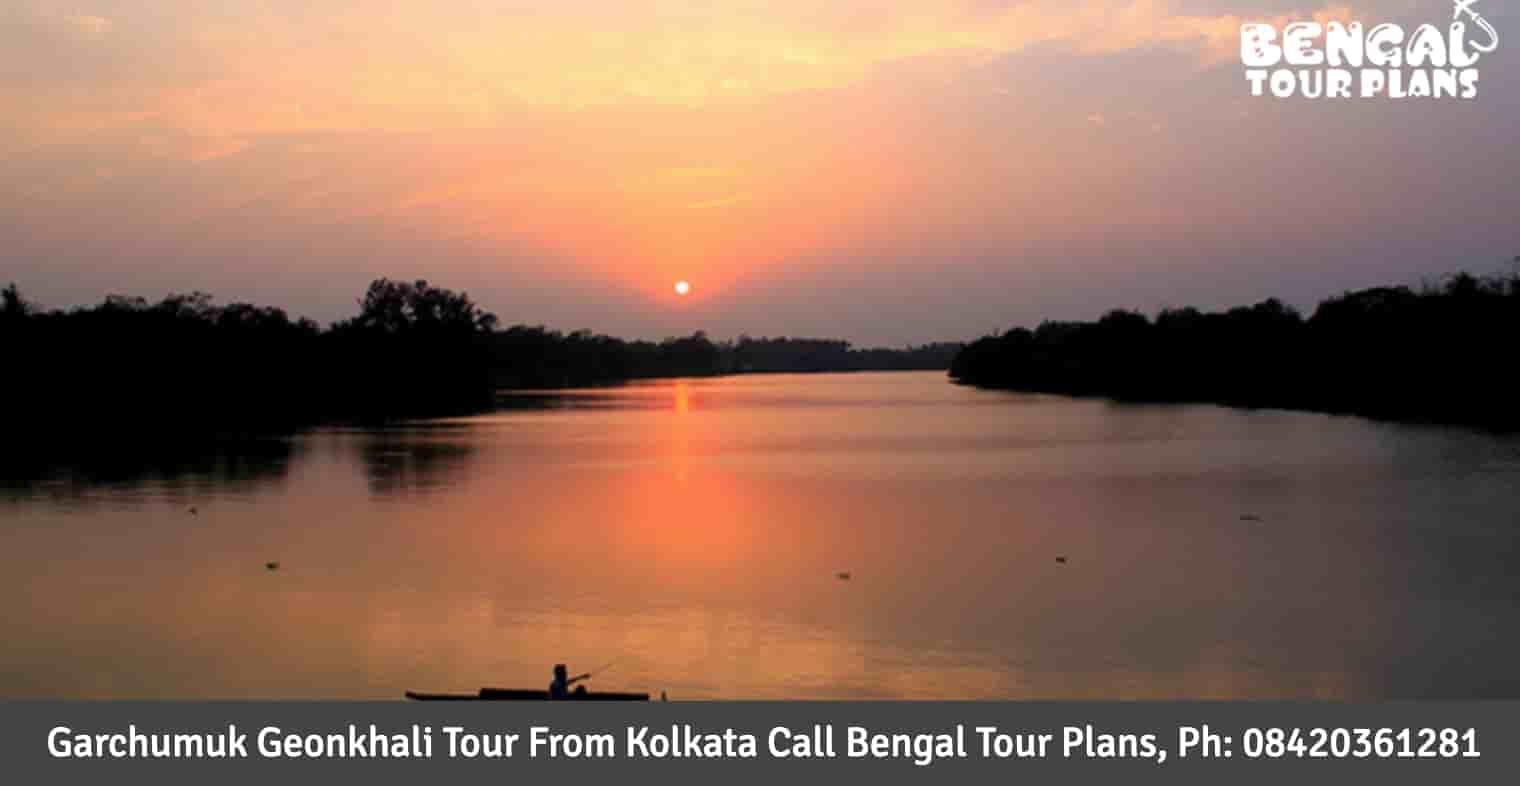 Garchumuk Geonkhali Tour From Kolkata